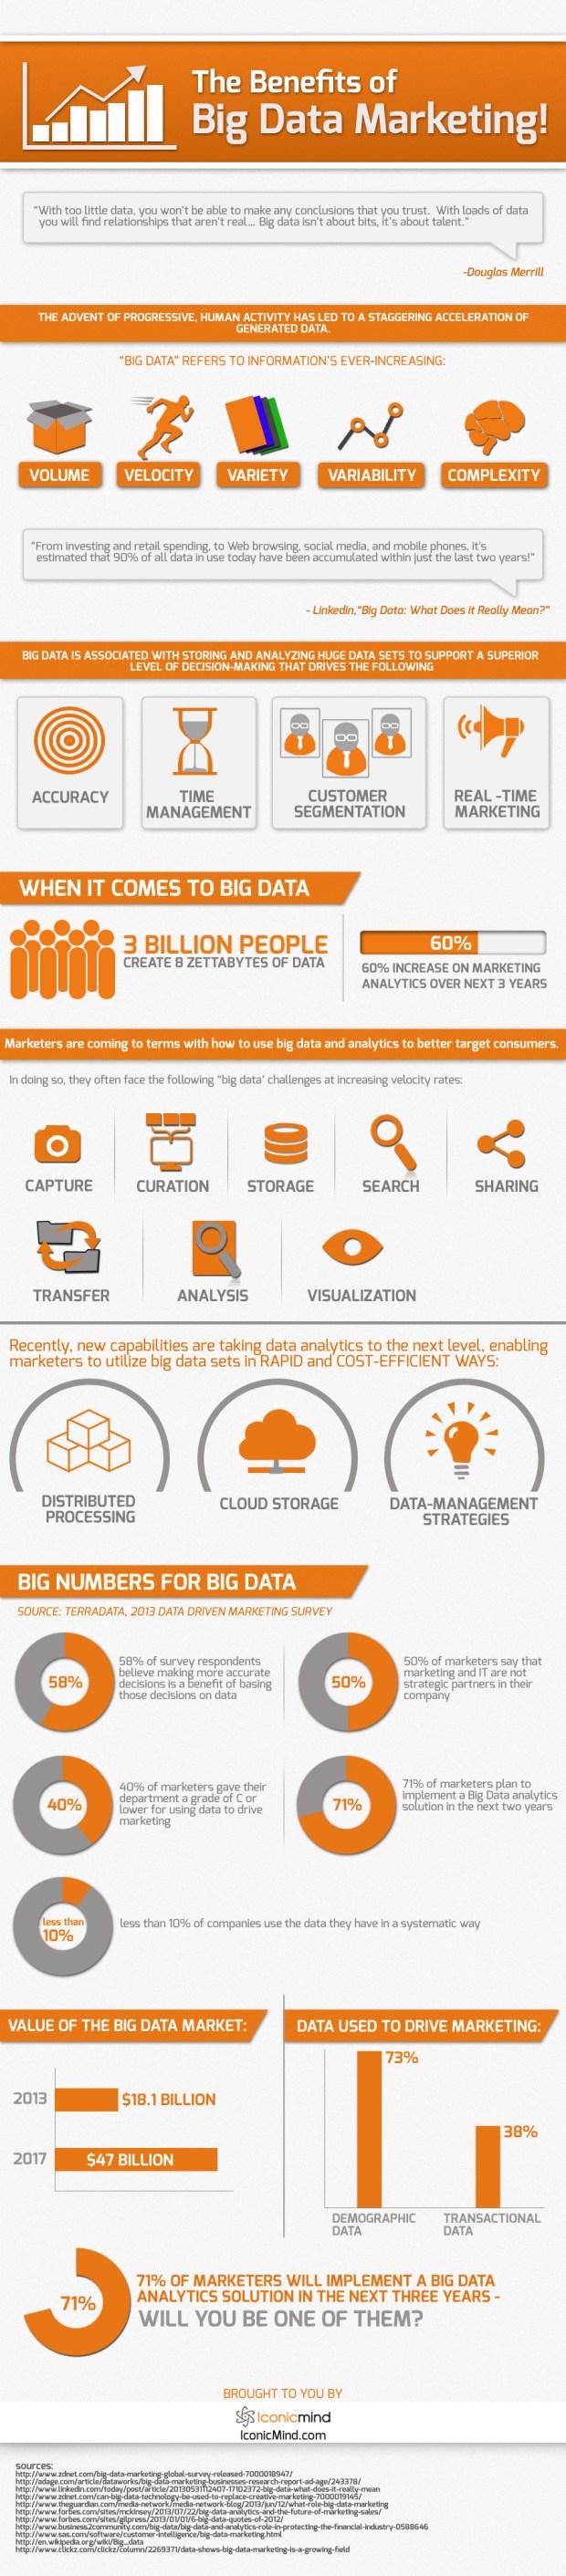 benefits of big data marketing